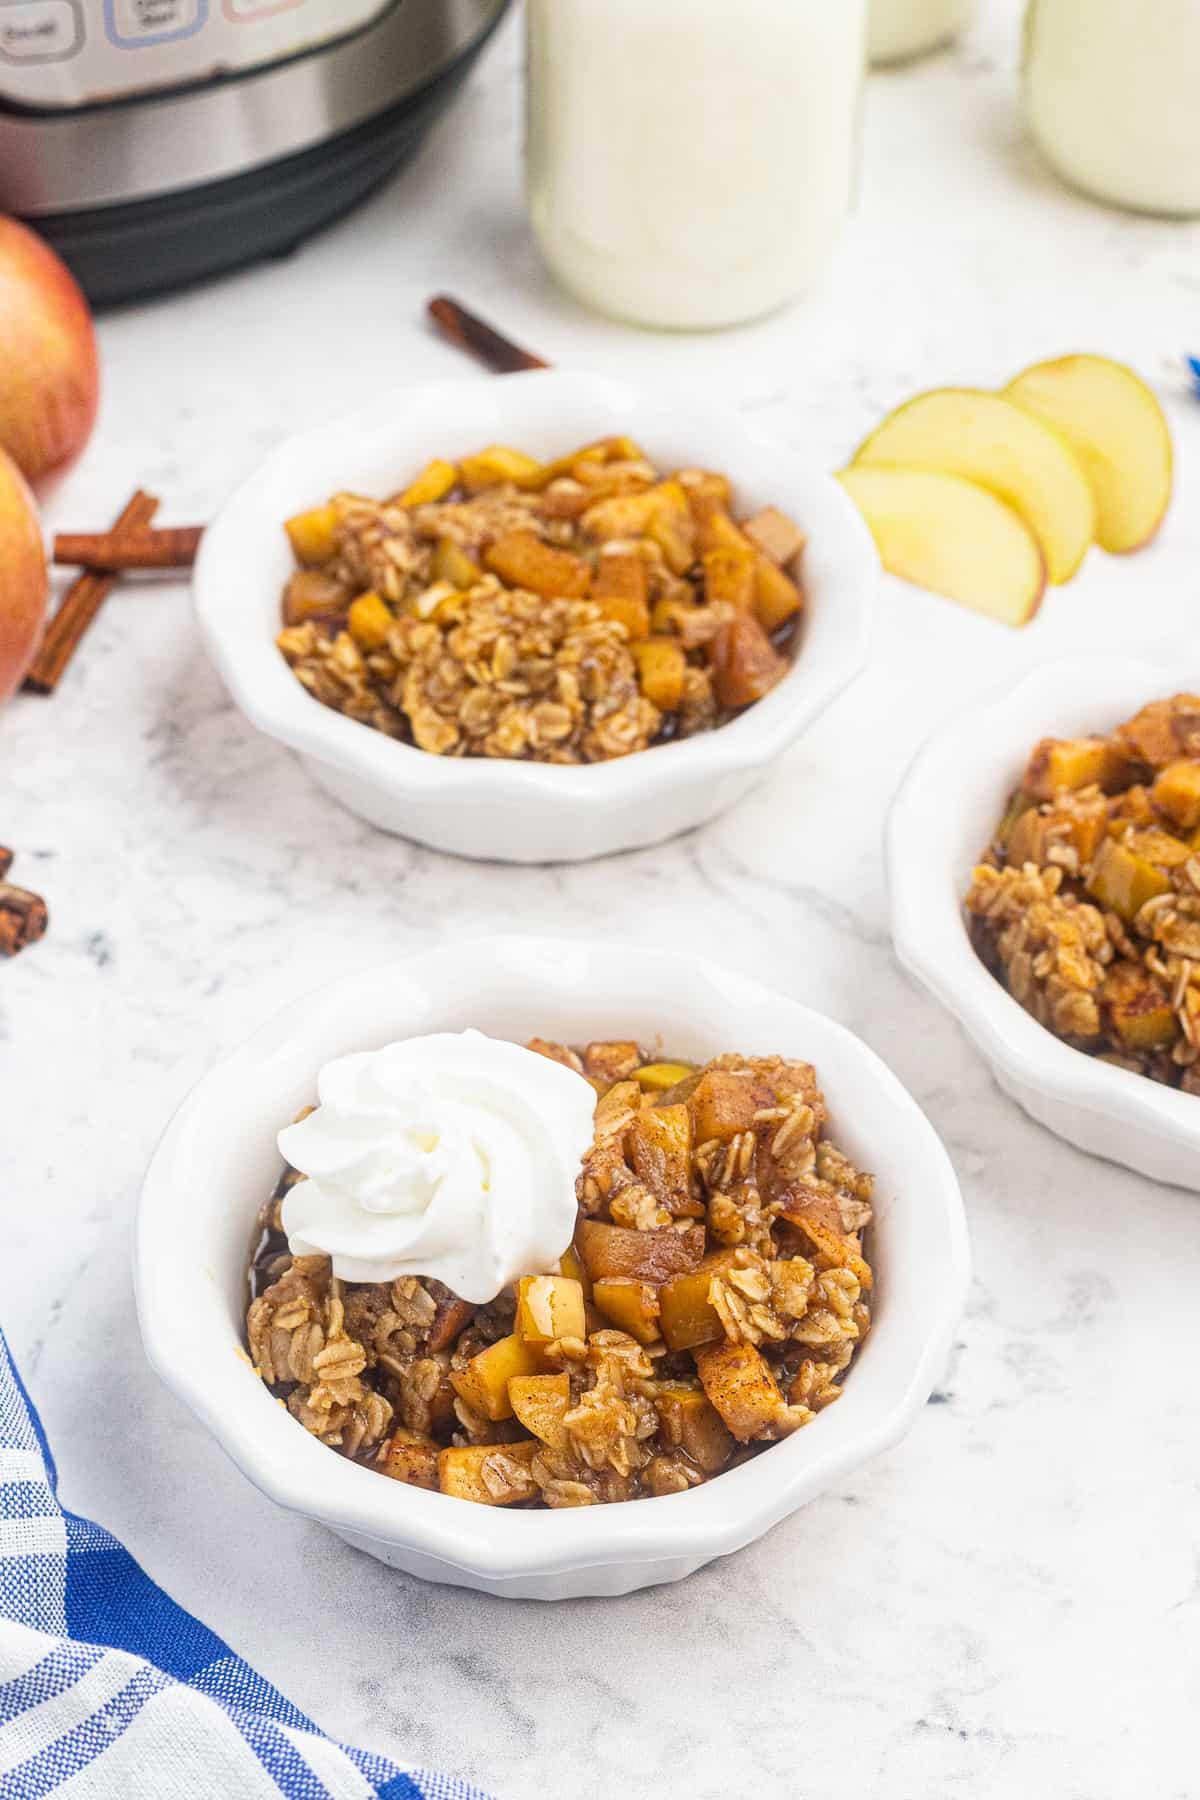 instant pot apple crisp in white bowls